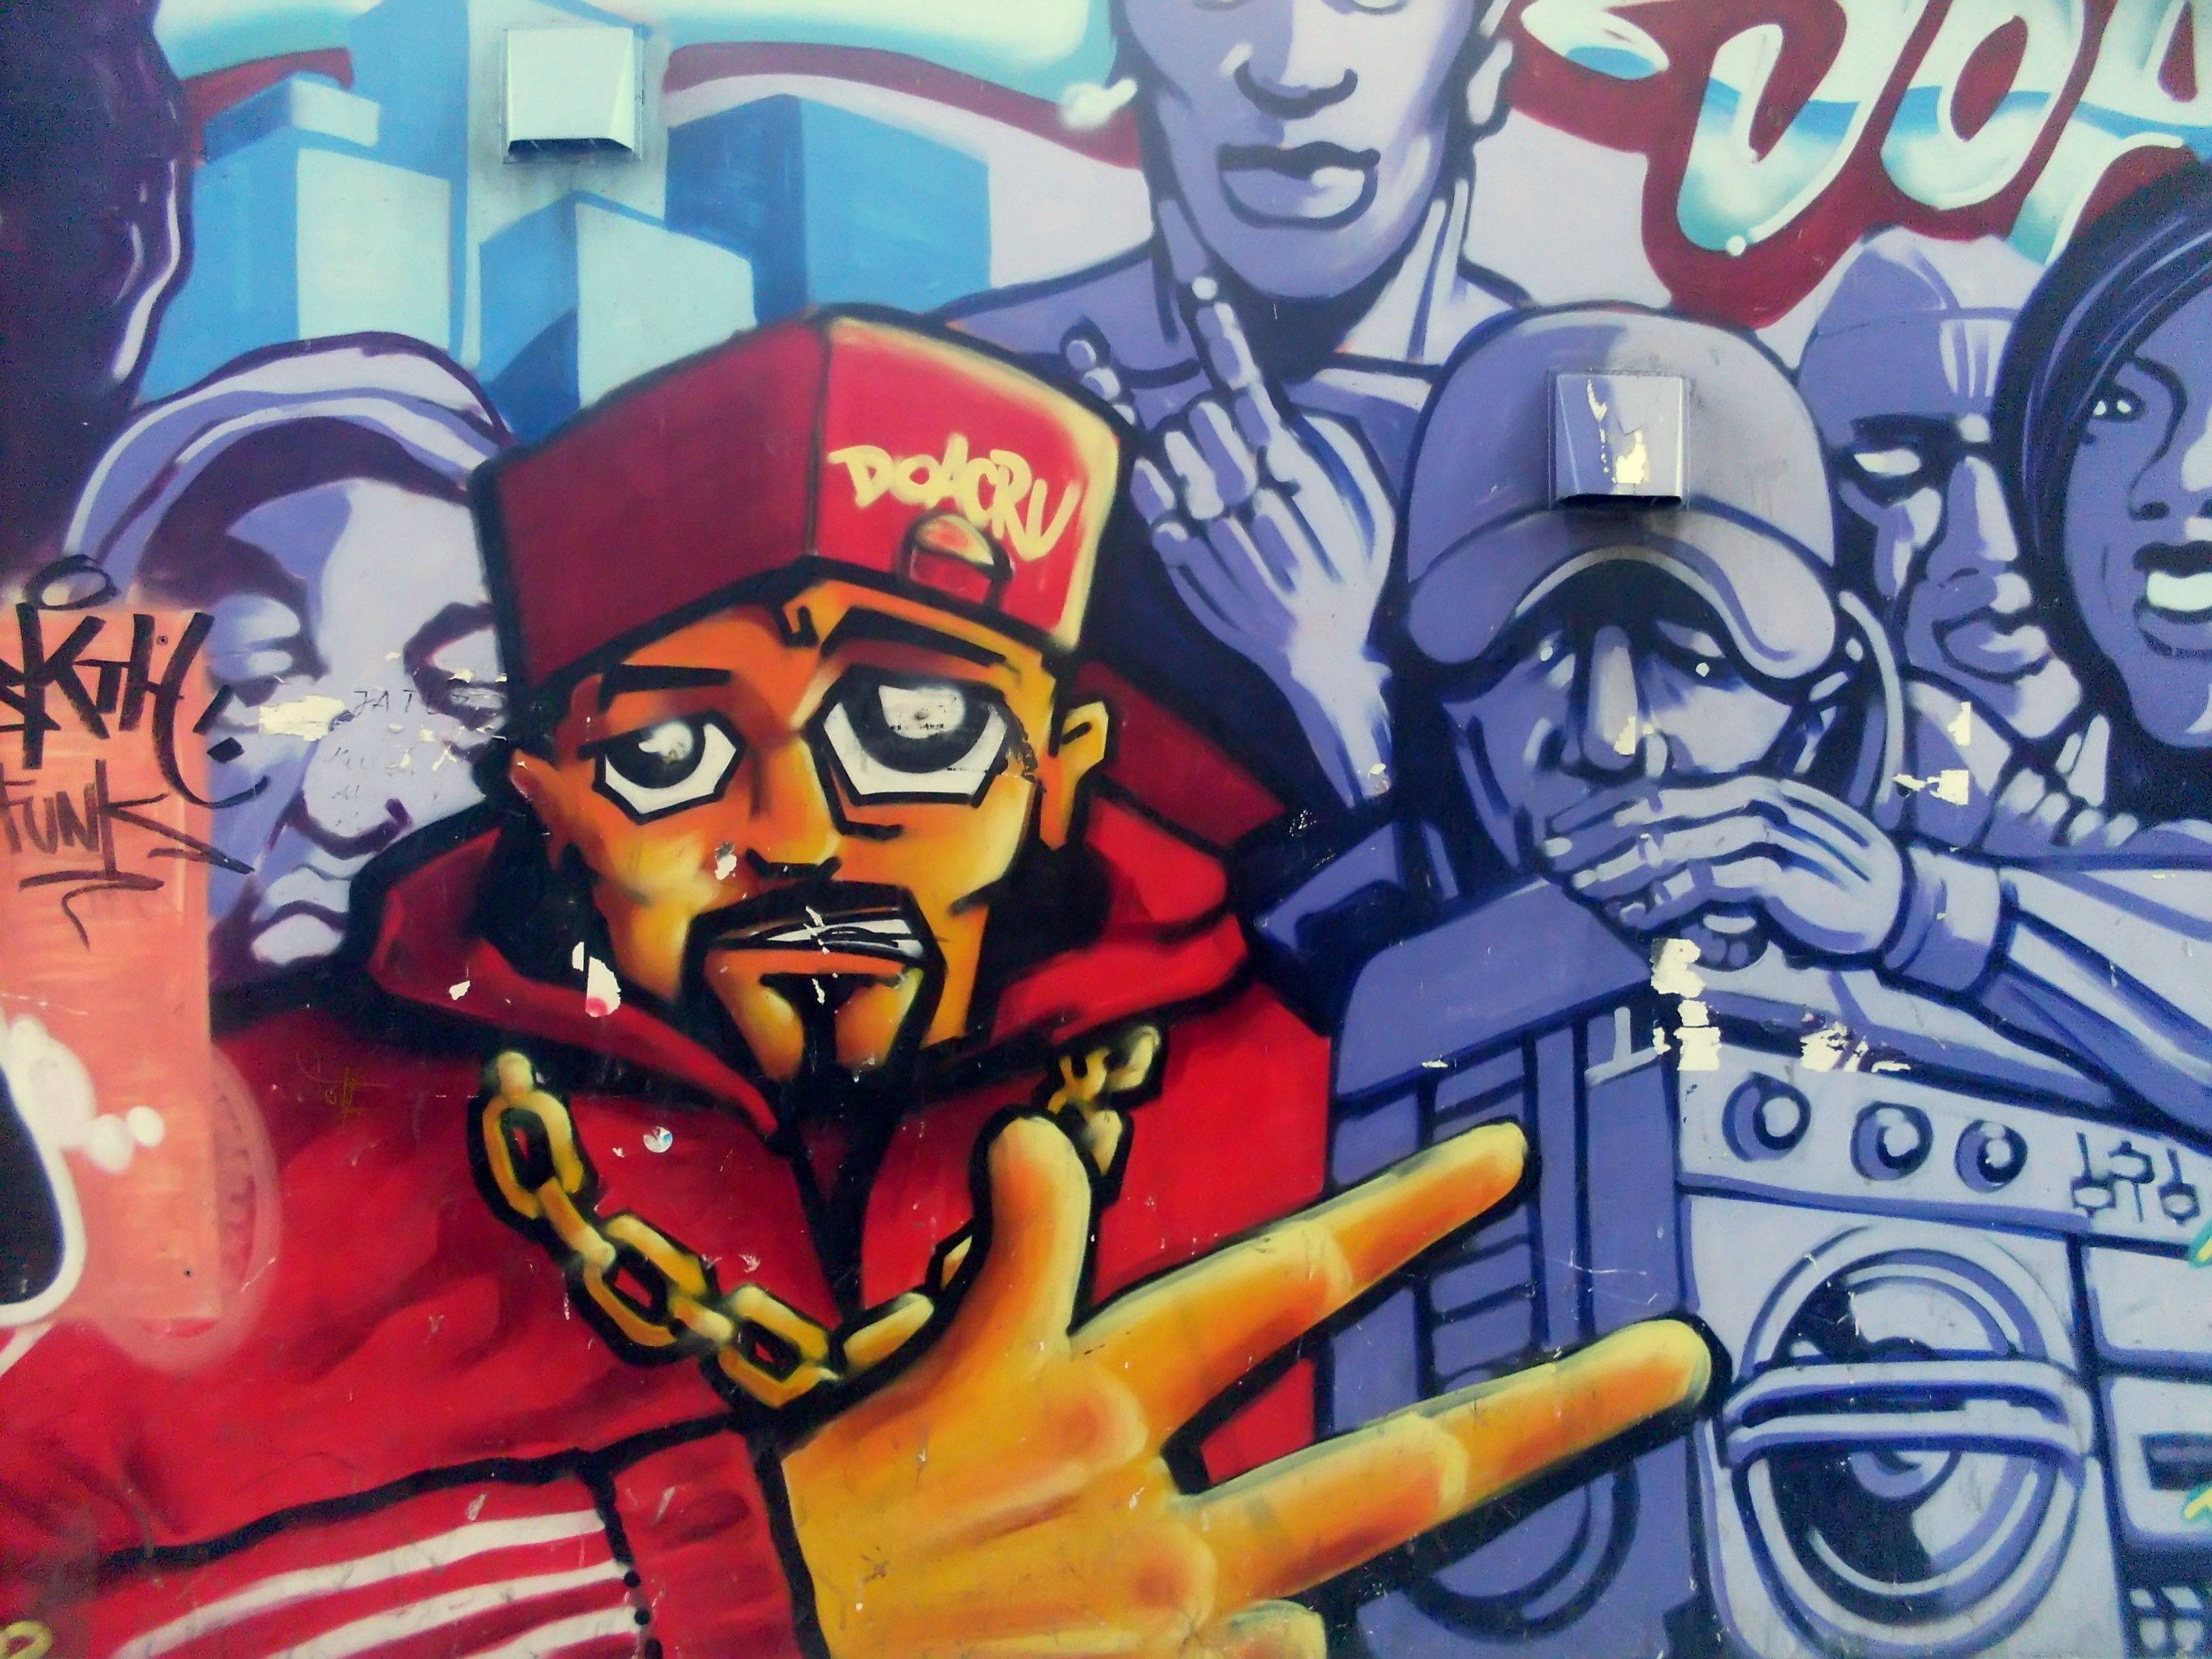 Graffiti at ulica morska in gdynia graffiti bridge for Immagini graffiti hd